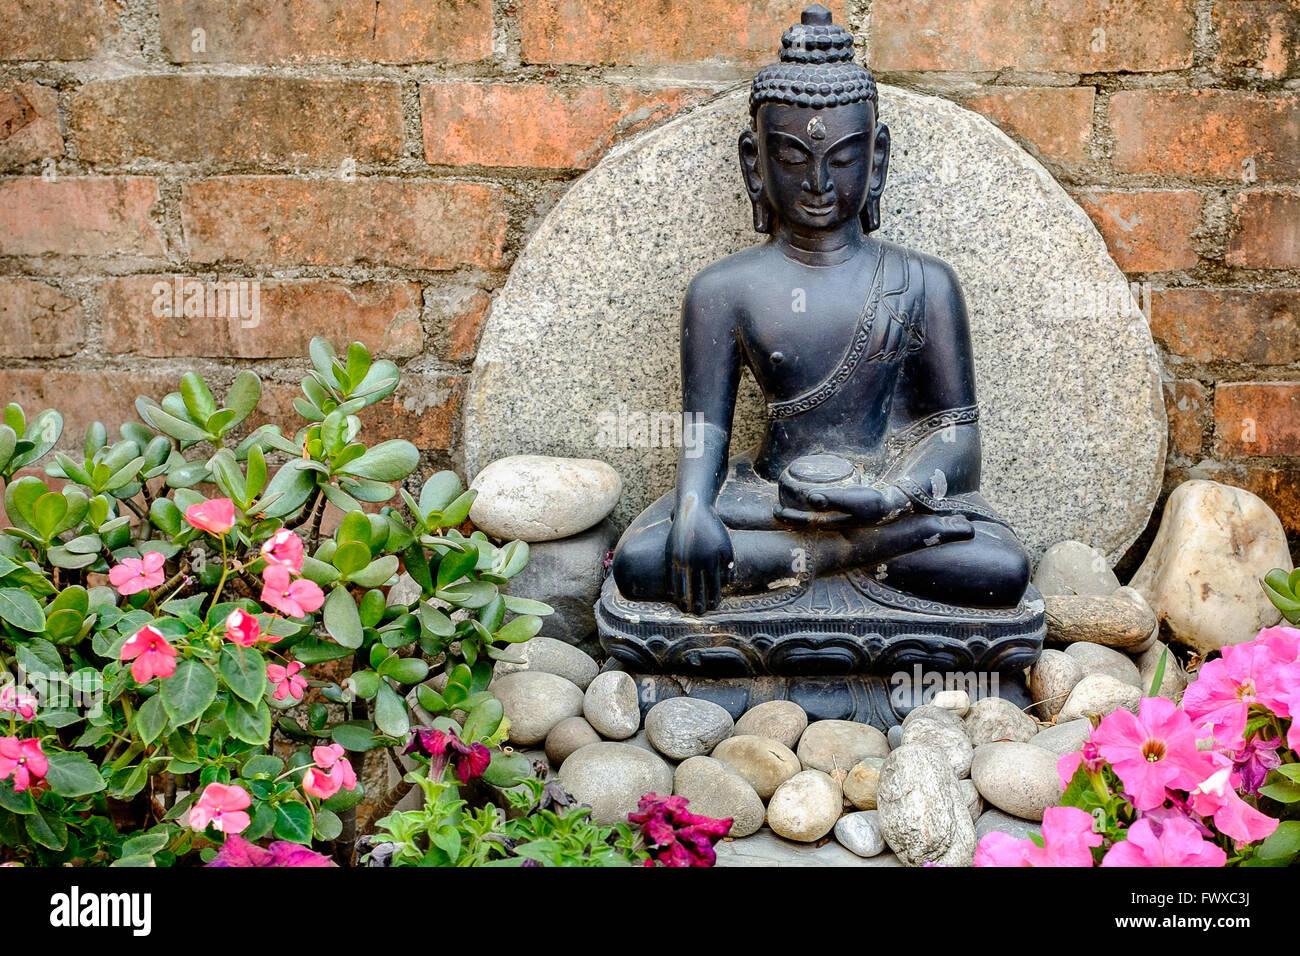 Small Buddha Statue As A Garden Feature Stock Photo Alamy